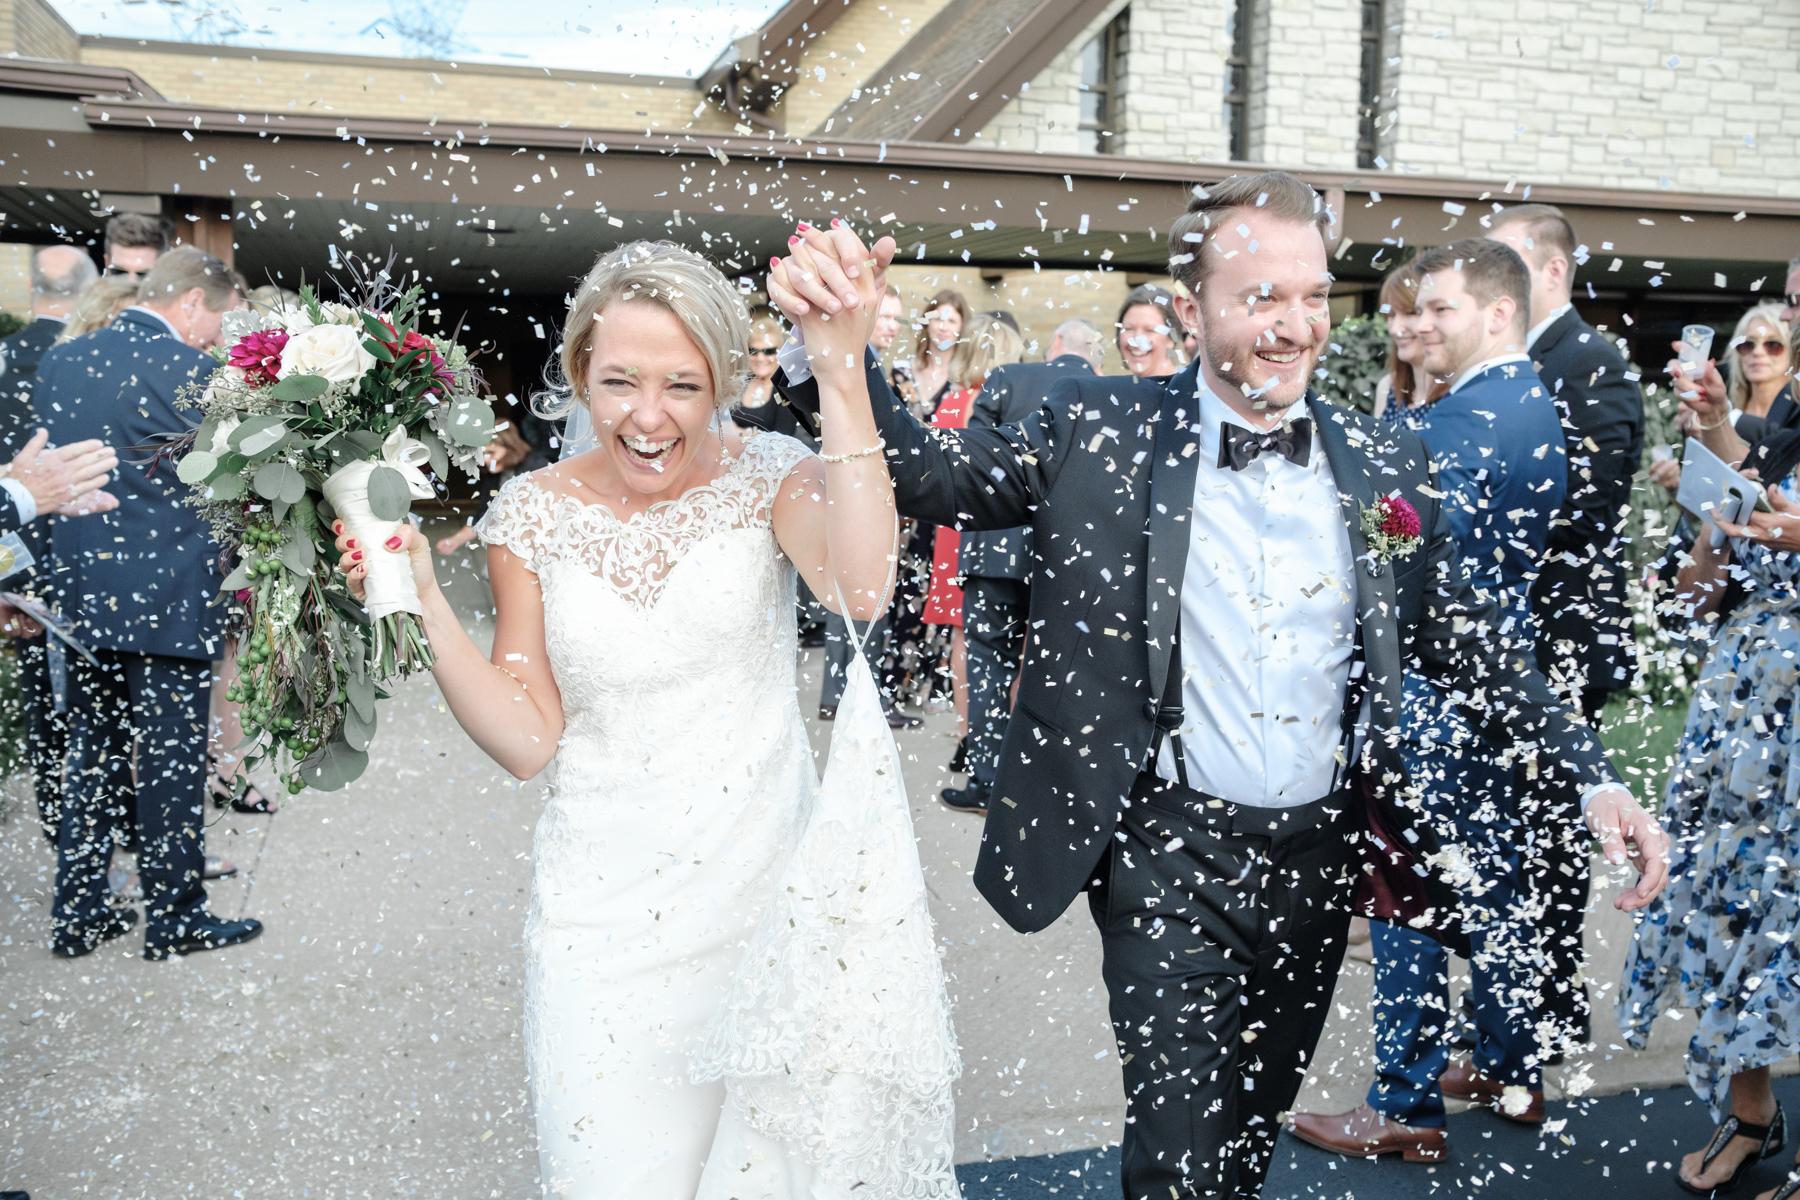 2017_BAP_KalliMatt_Gleneagles_CountryClub_Lemont_Wedding-51.jpg